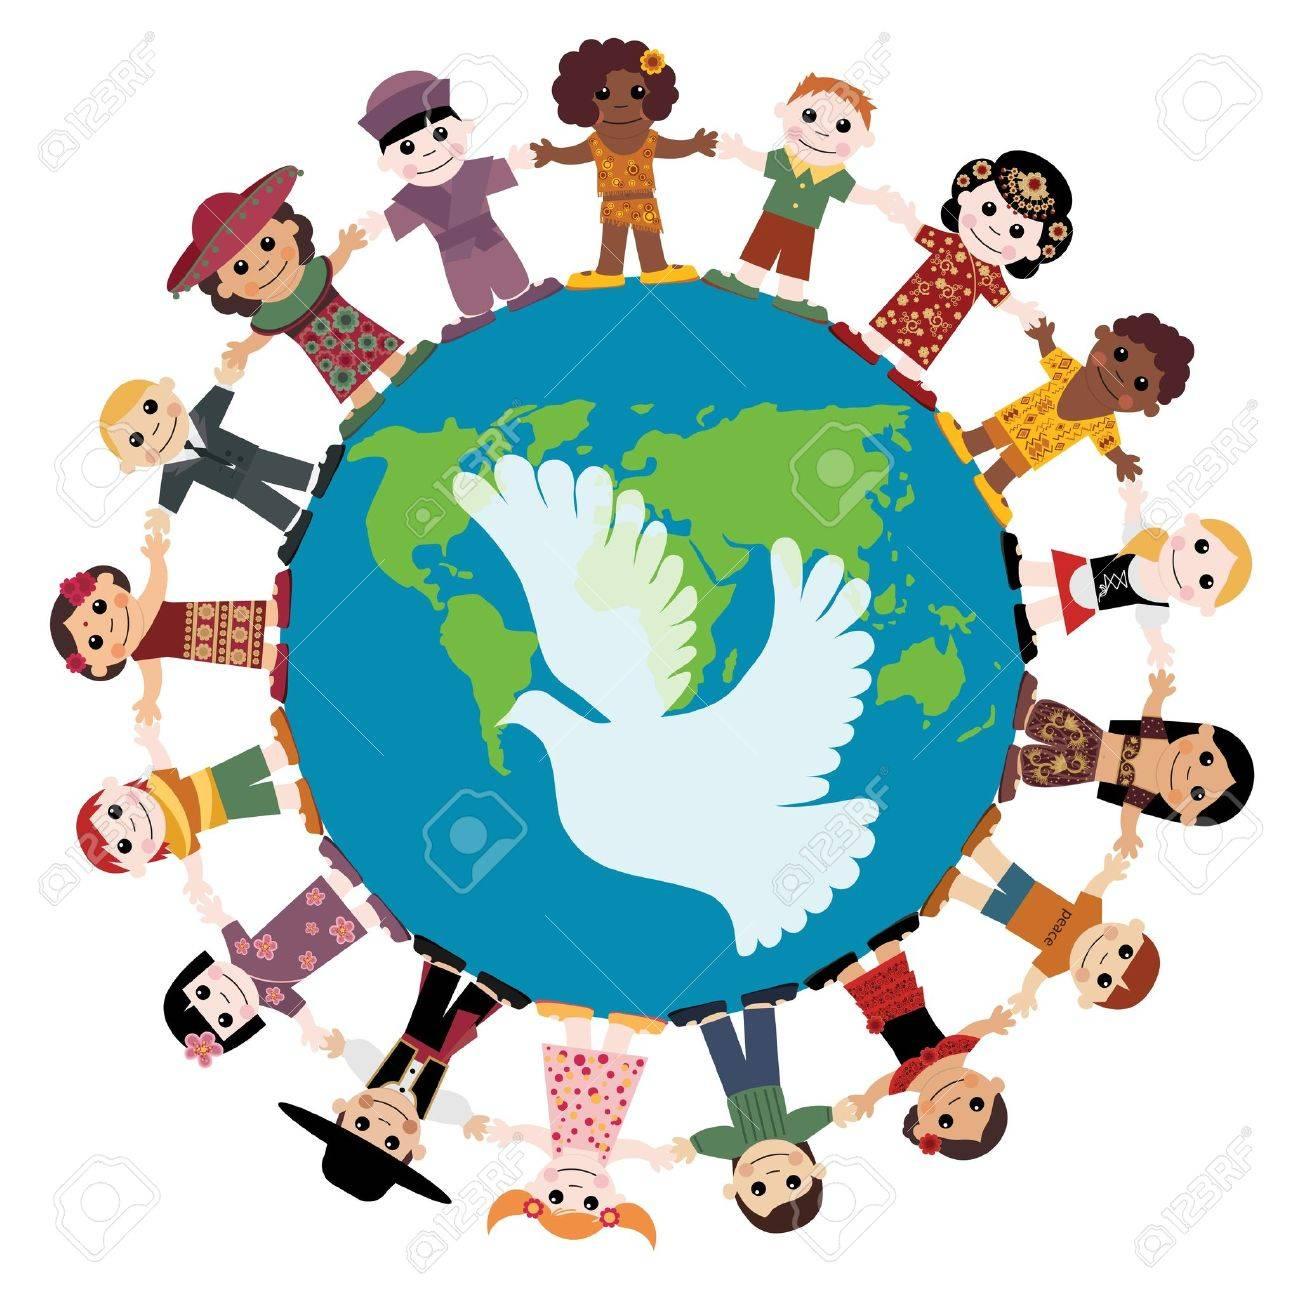 Happy children holding hands around the globe.